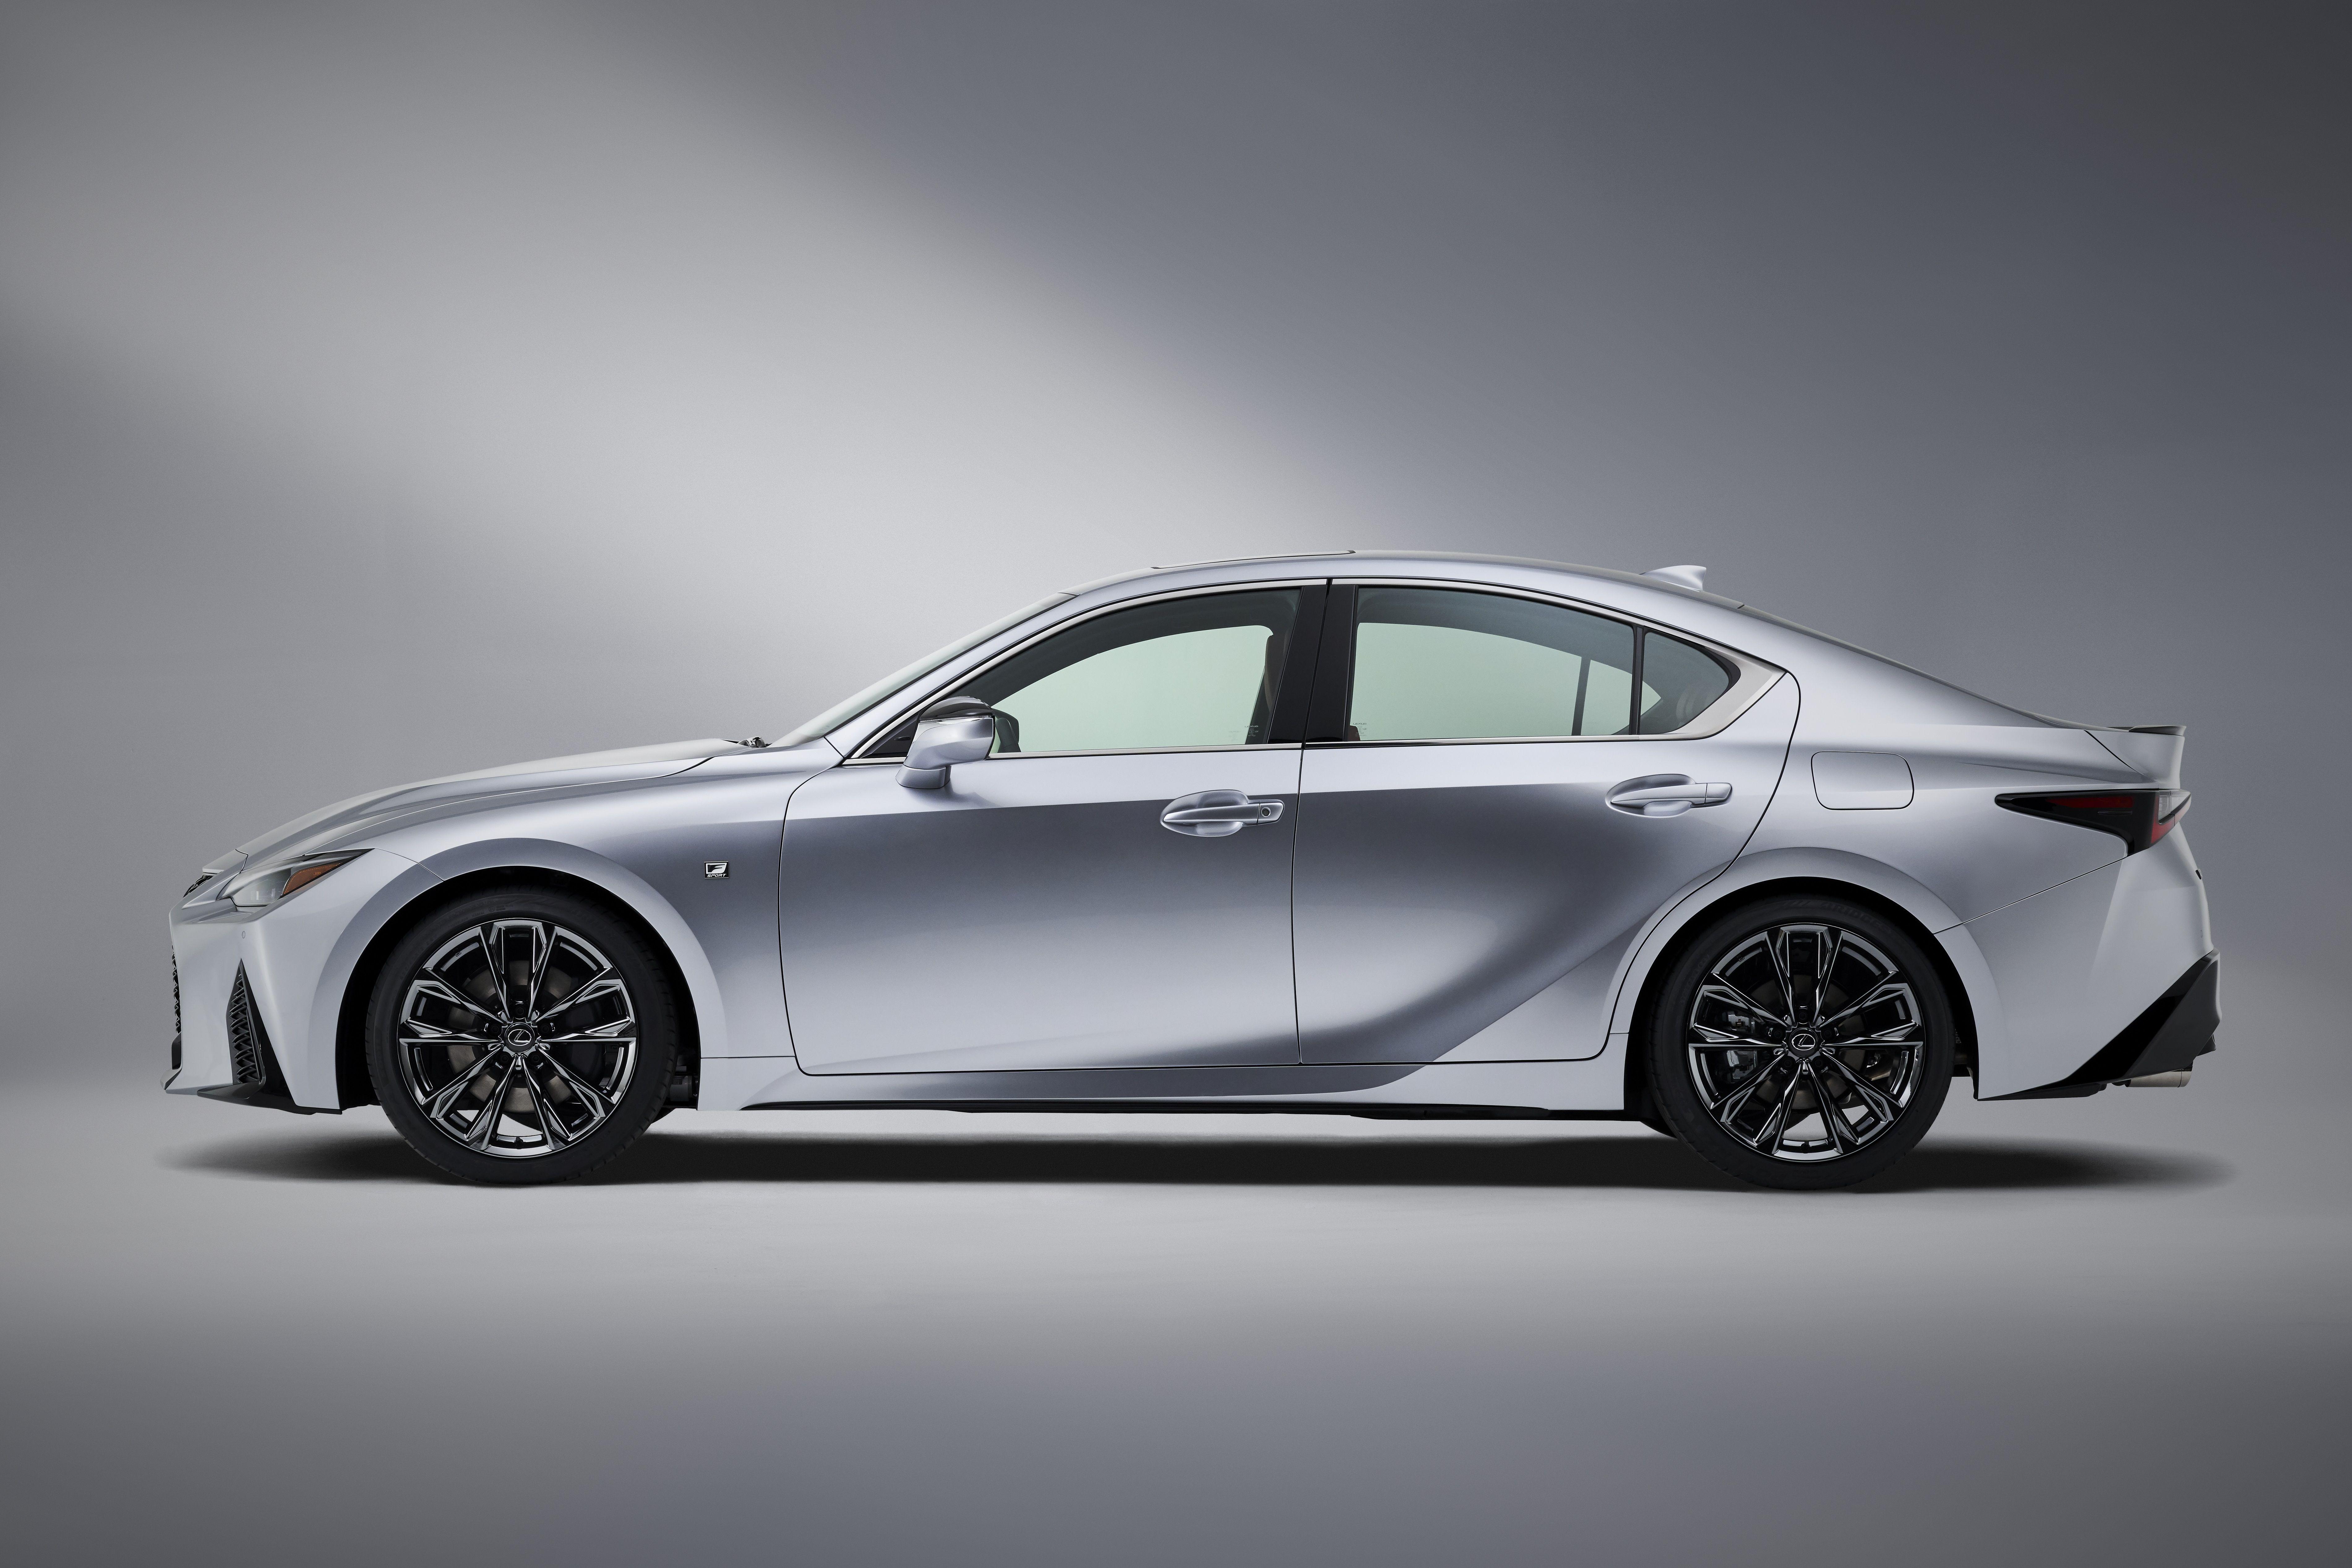 2021 Lexus Is 350 F Sport In 2020 Lexus Luxury Sedan Sedan